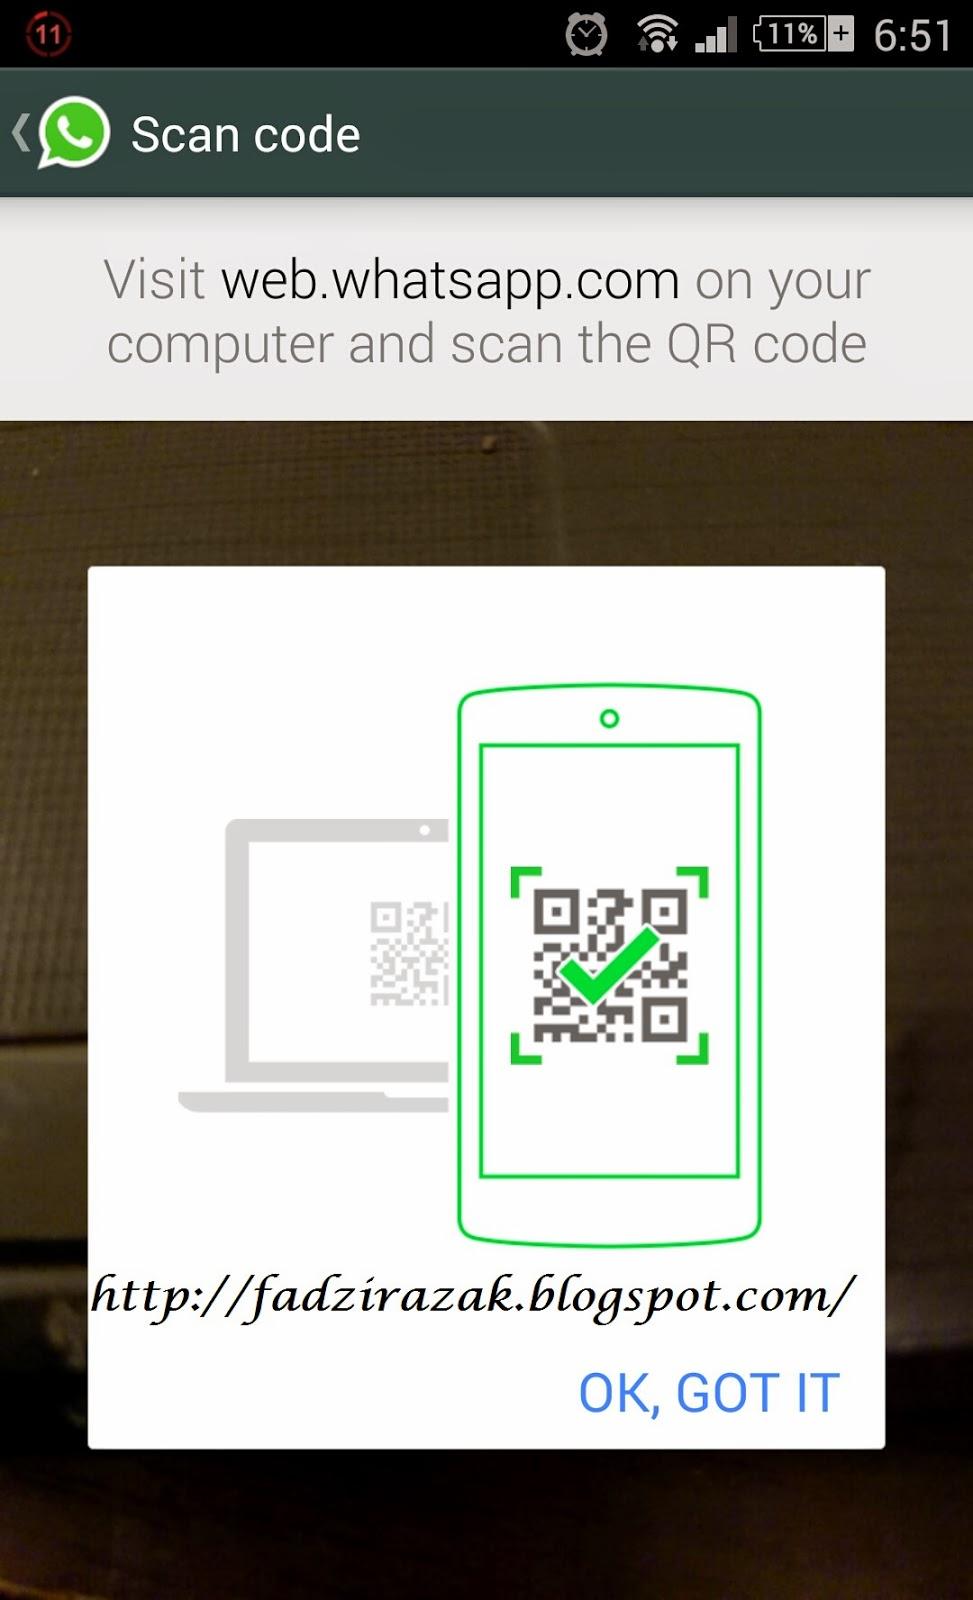 Scan code QR